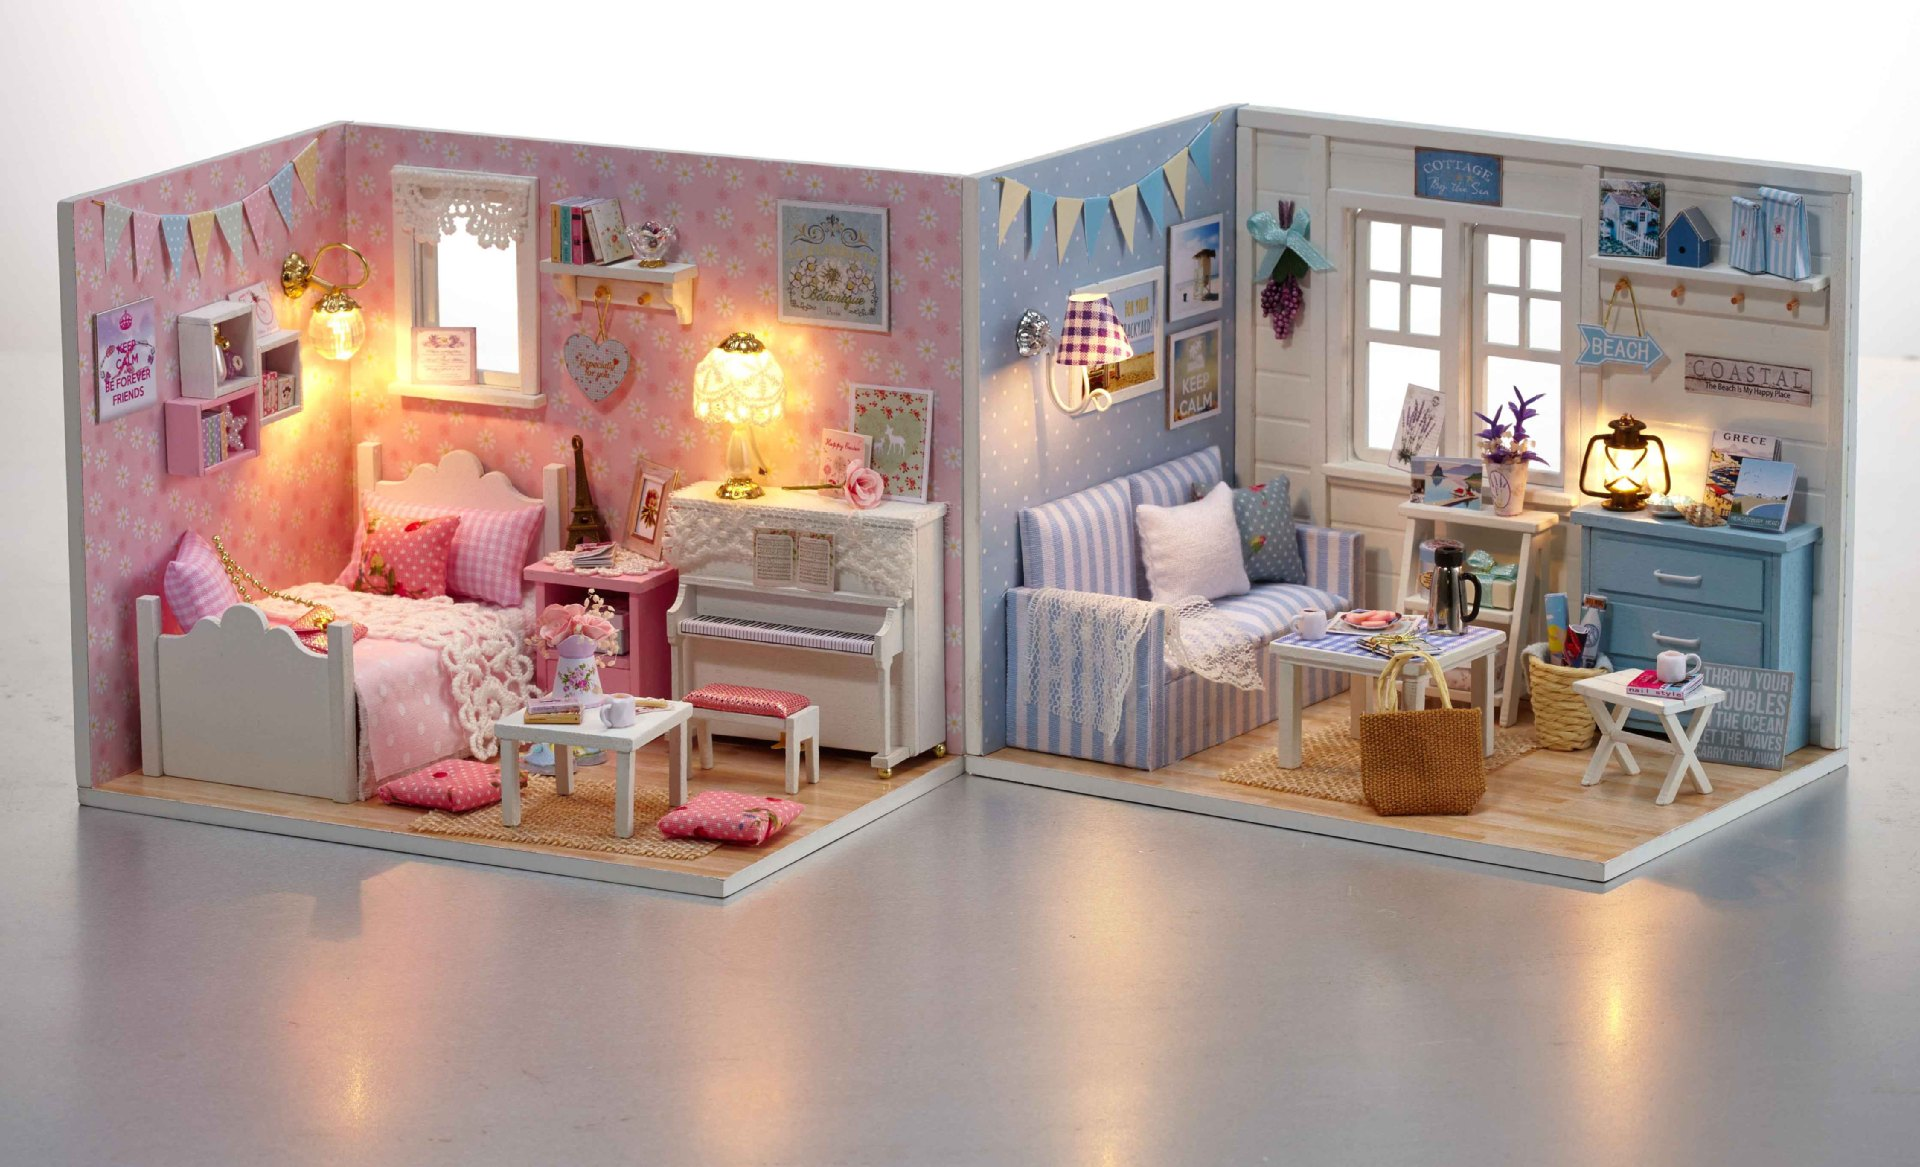 Doll House 3d Diy Model Kits Handmade Wooden Miniatura Furniture 3d Miniature Dollhouse Toys Blocks Girlfriend